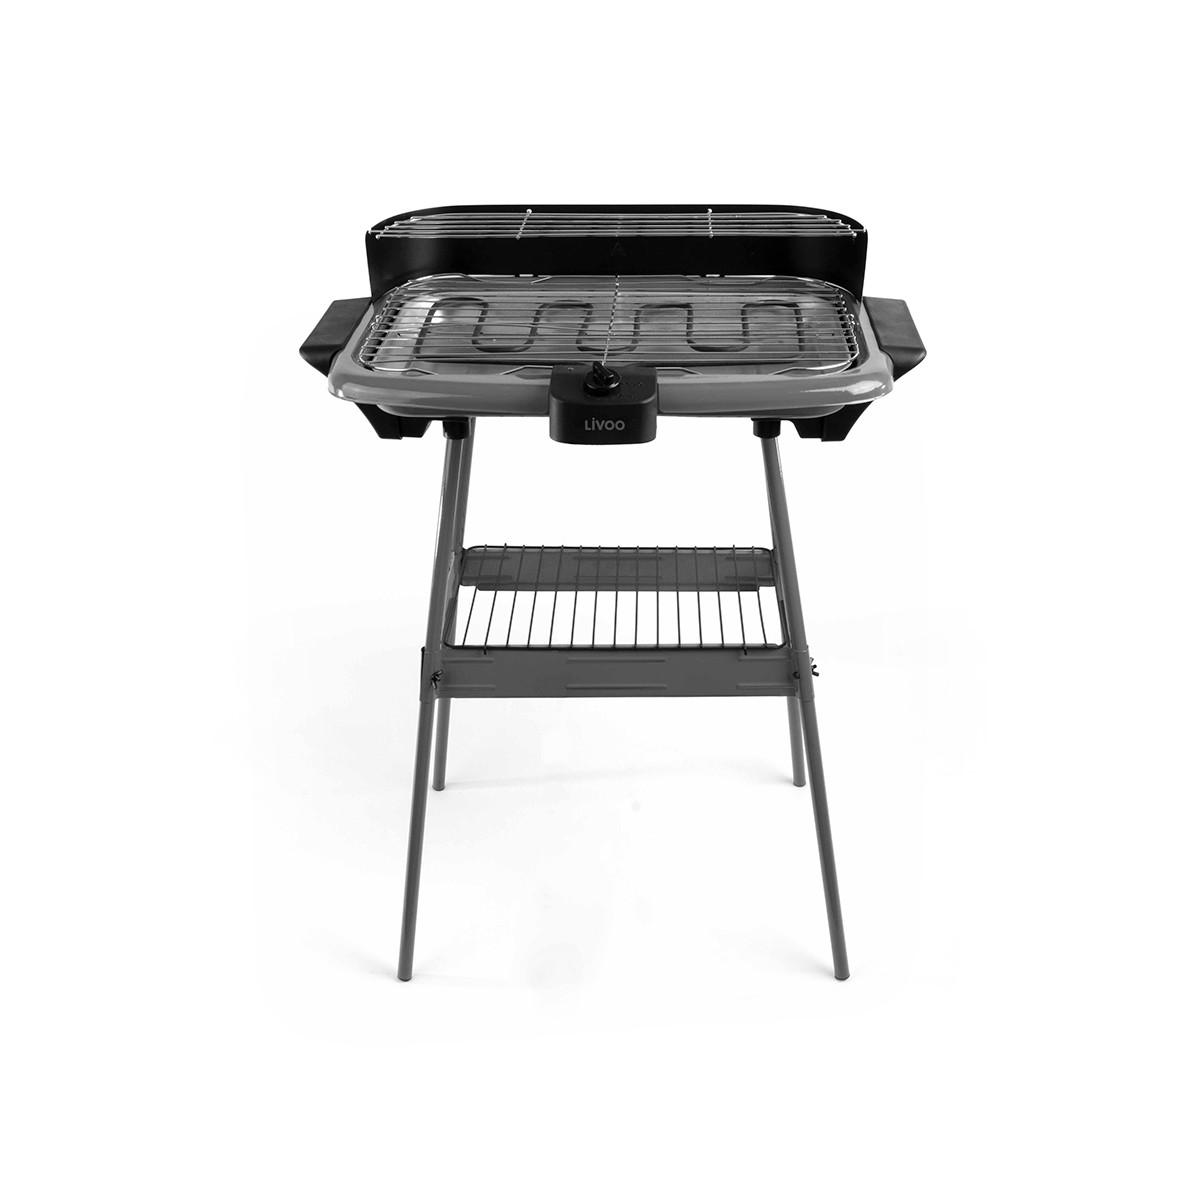 Livoo Barbecue electrique sur pieds en Métal Gris